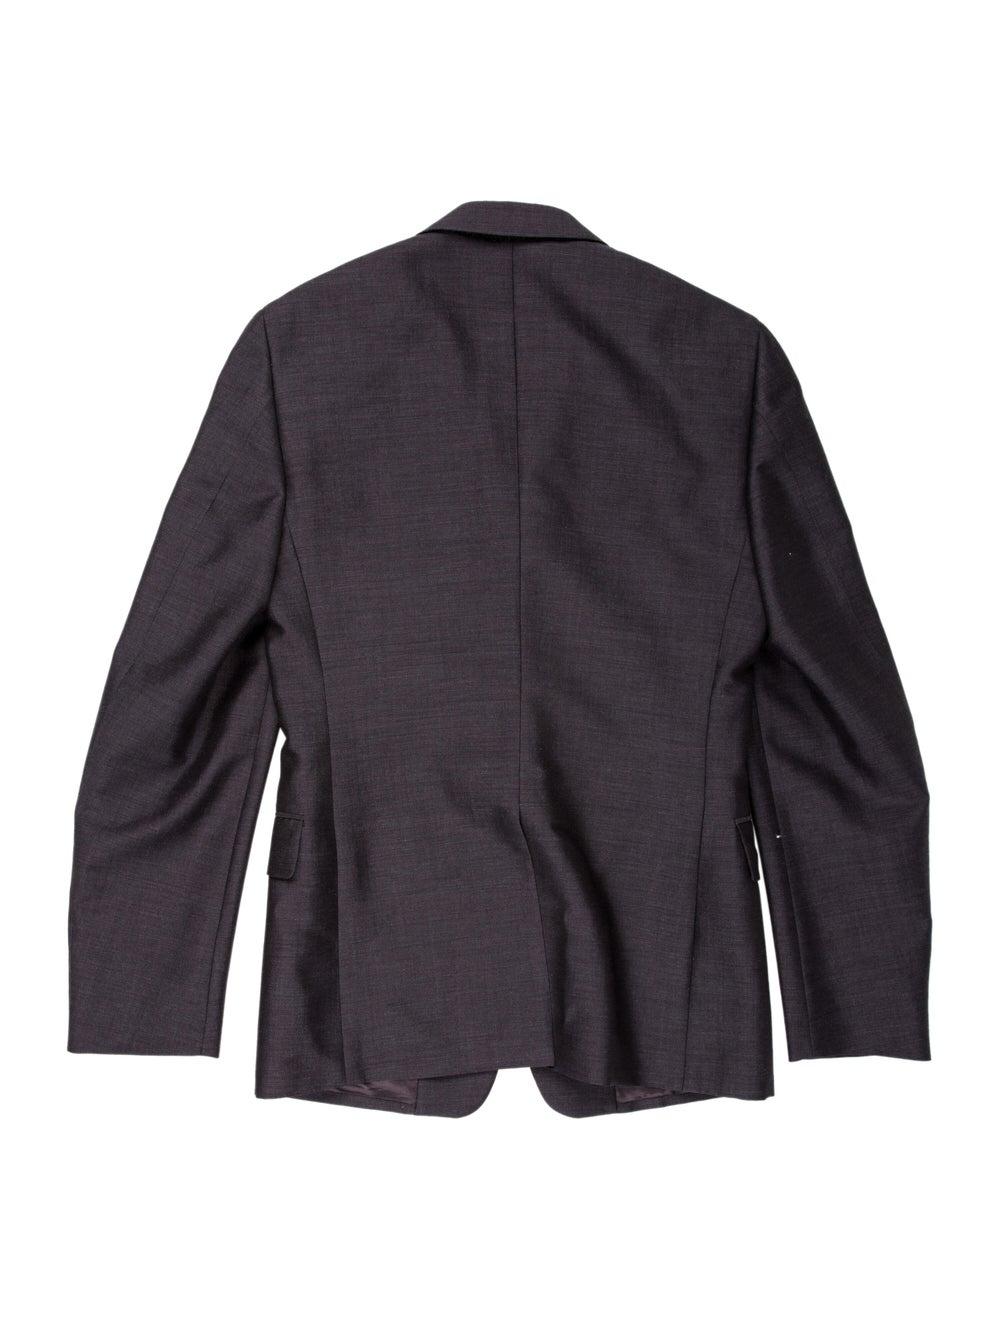 Prada Mohair Two-Piece Suit Grey - image 2